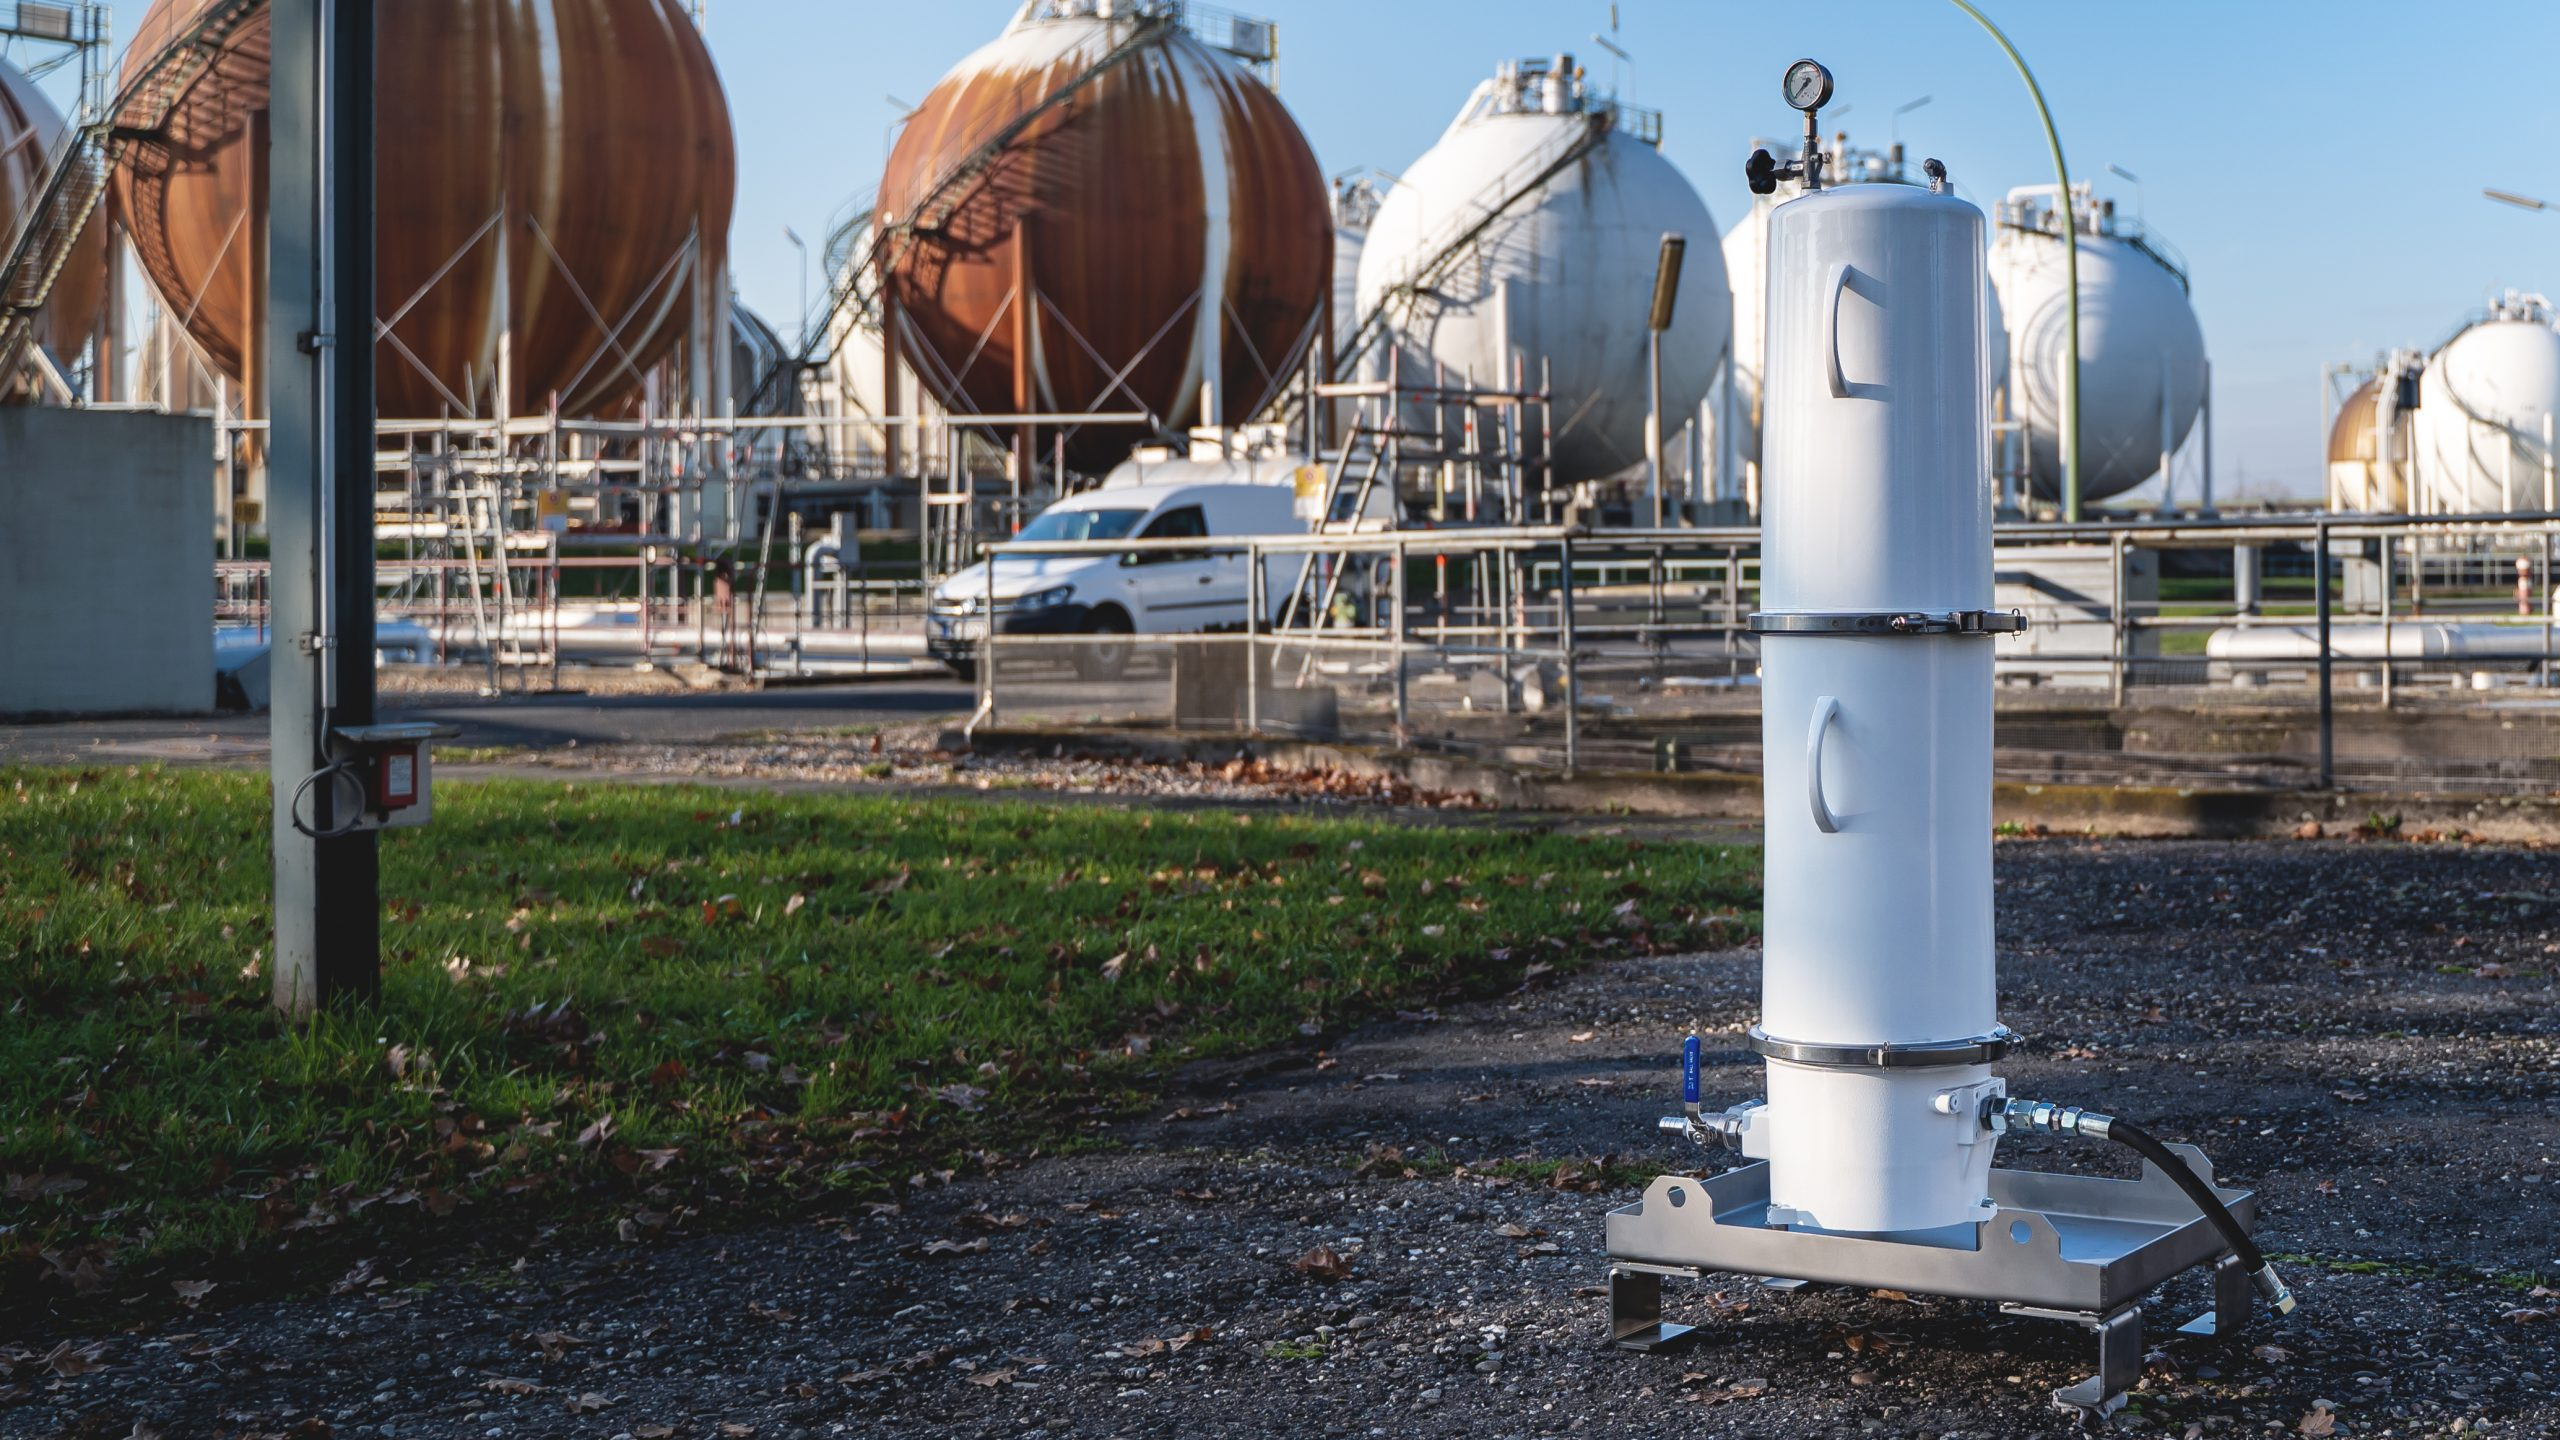 Filteranlage energy support forestisland 2